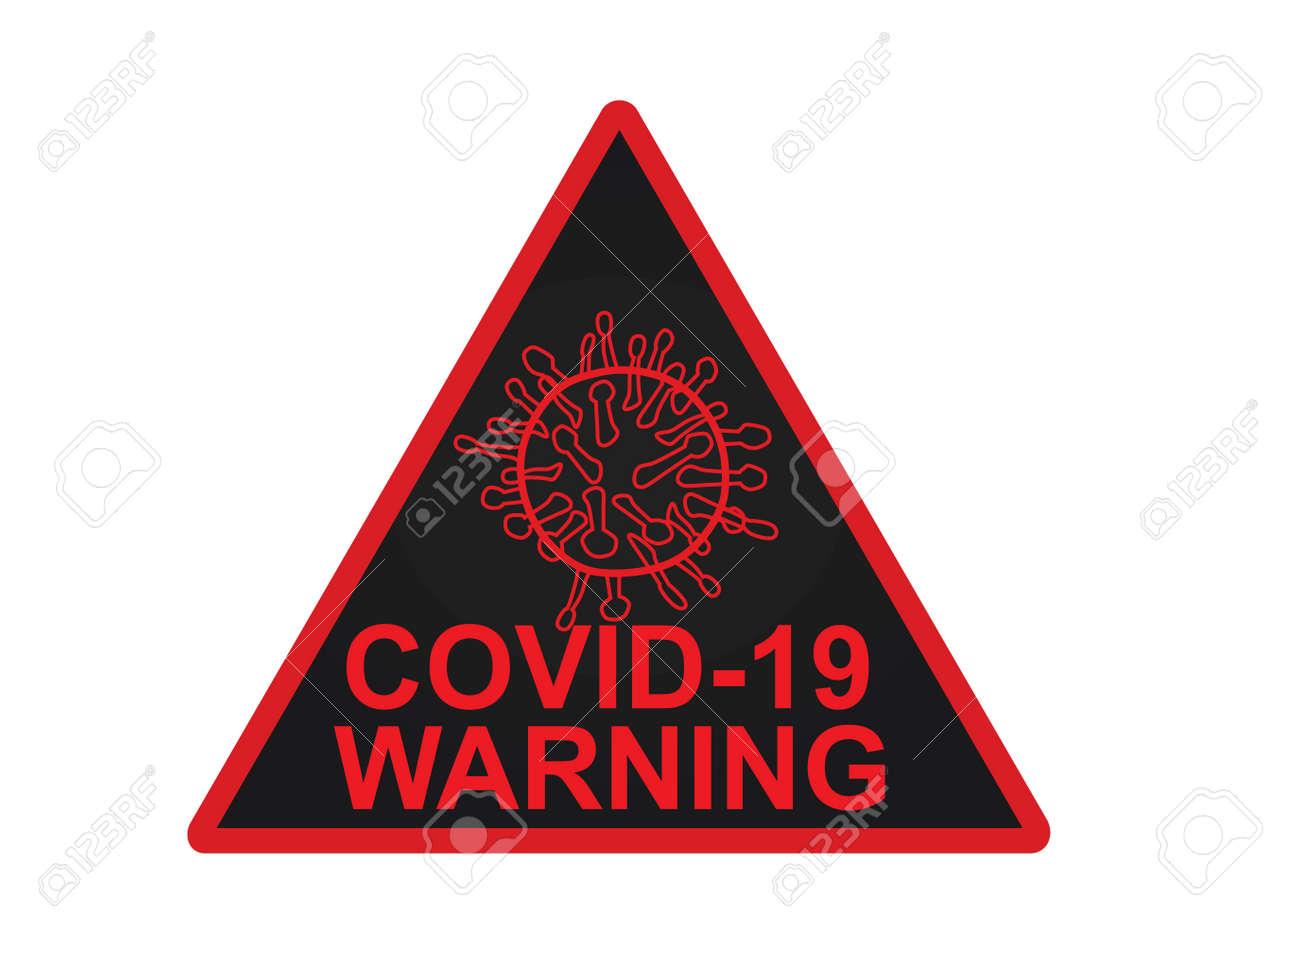 Coronavirus. COVID19 warning sign. vector - 163729702